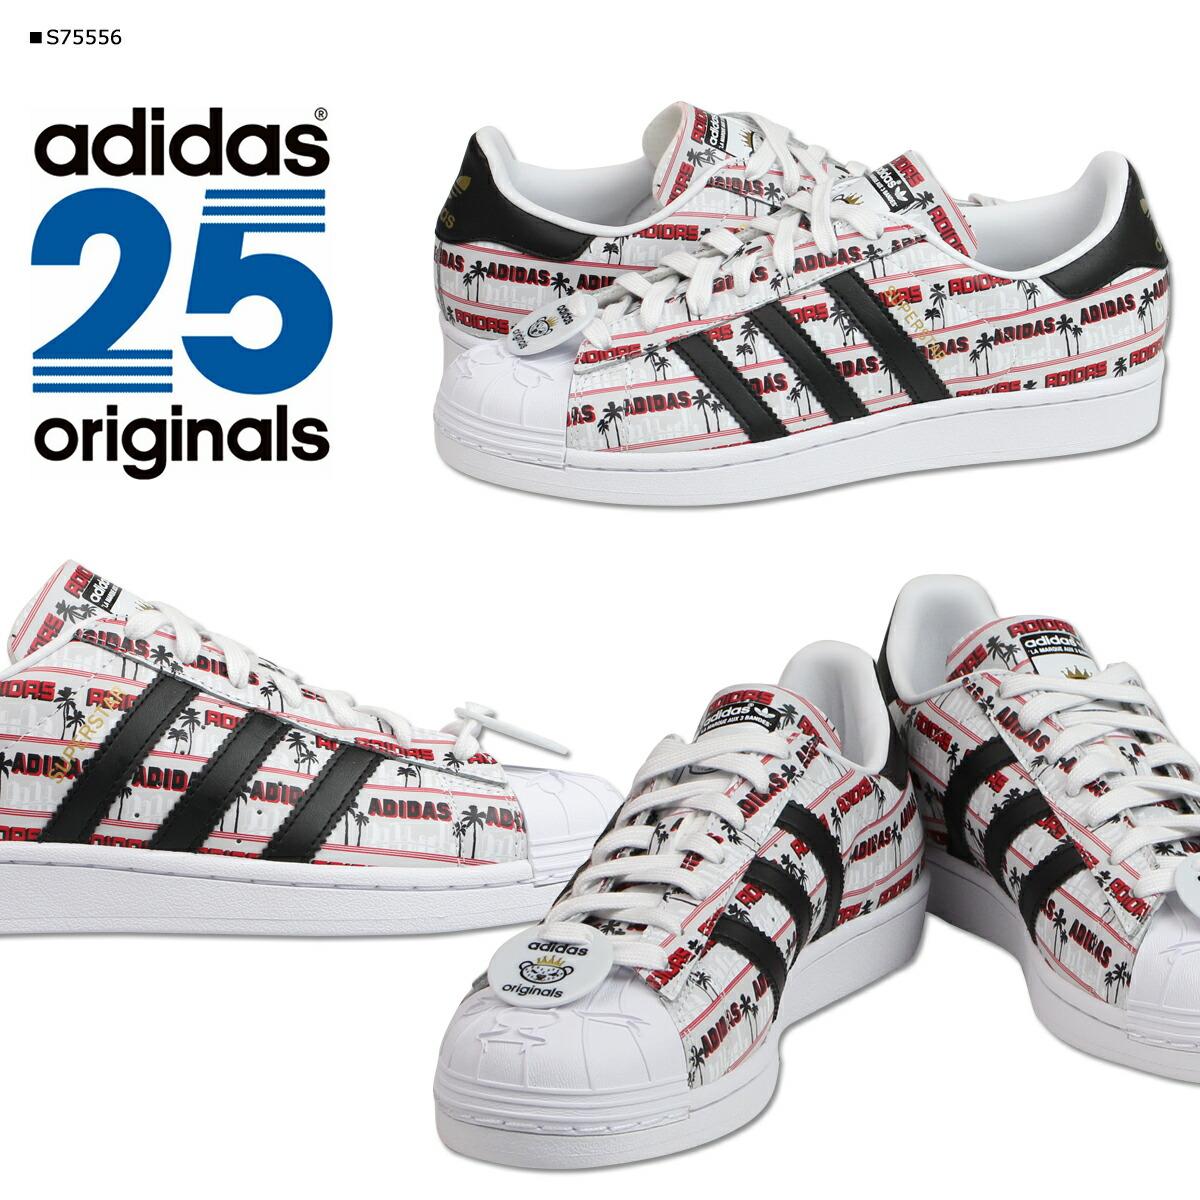 Adidas Superstar Nigo Bearfoot chaussures noir blanc